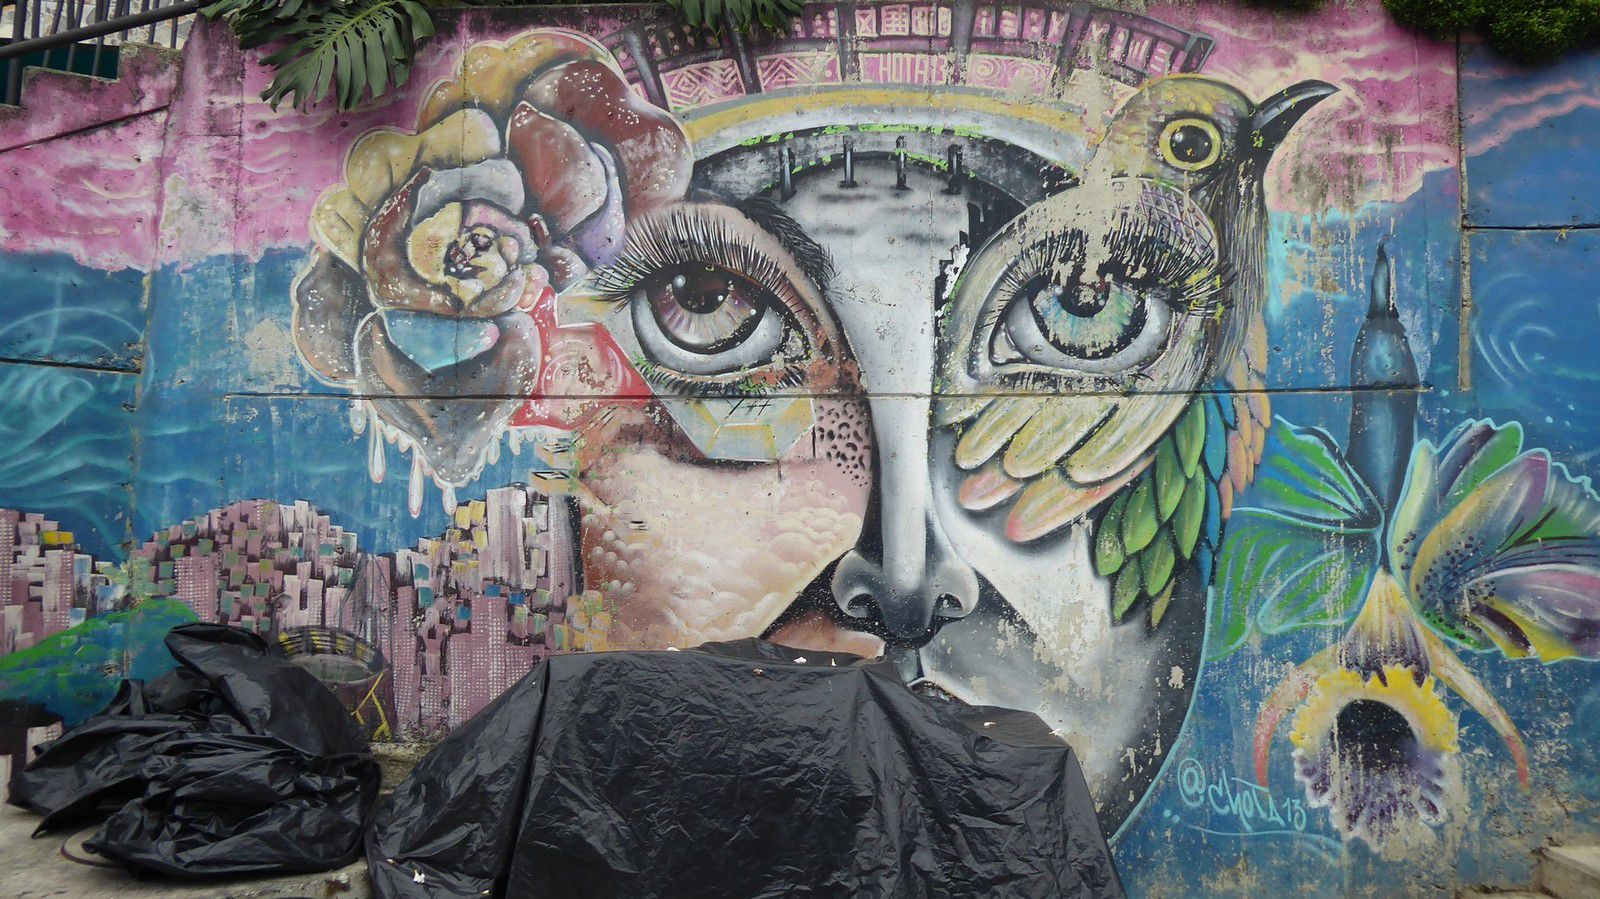 J28 - Mercredi 15 Janvier 2020 - Medellin, la Comuna 13